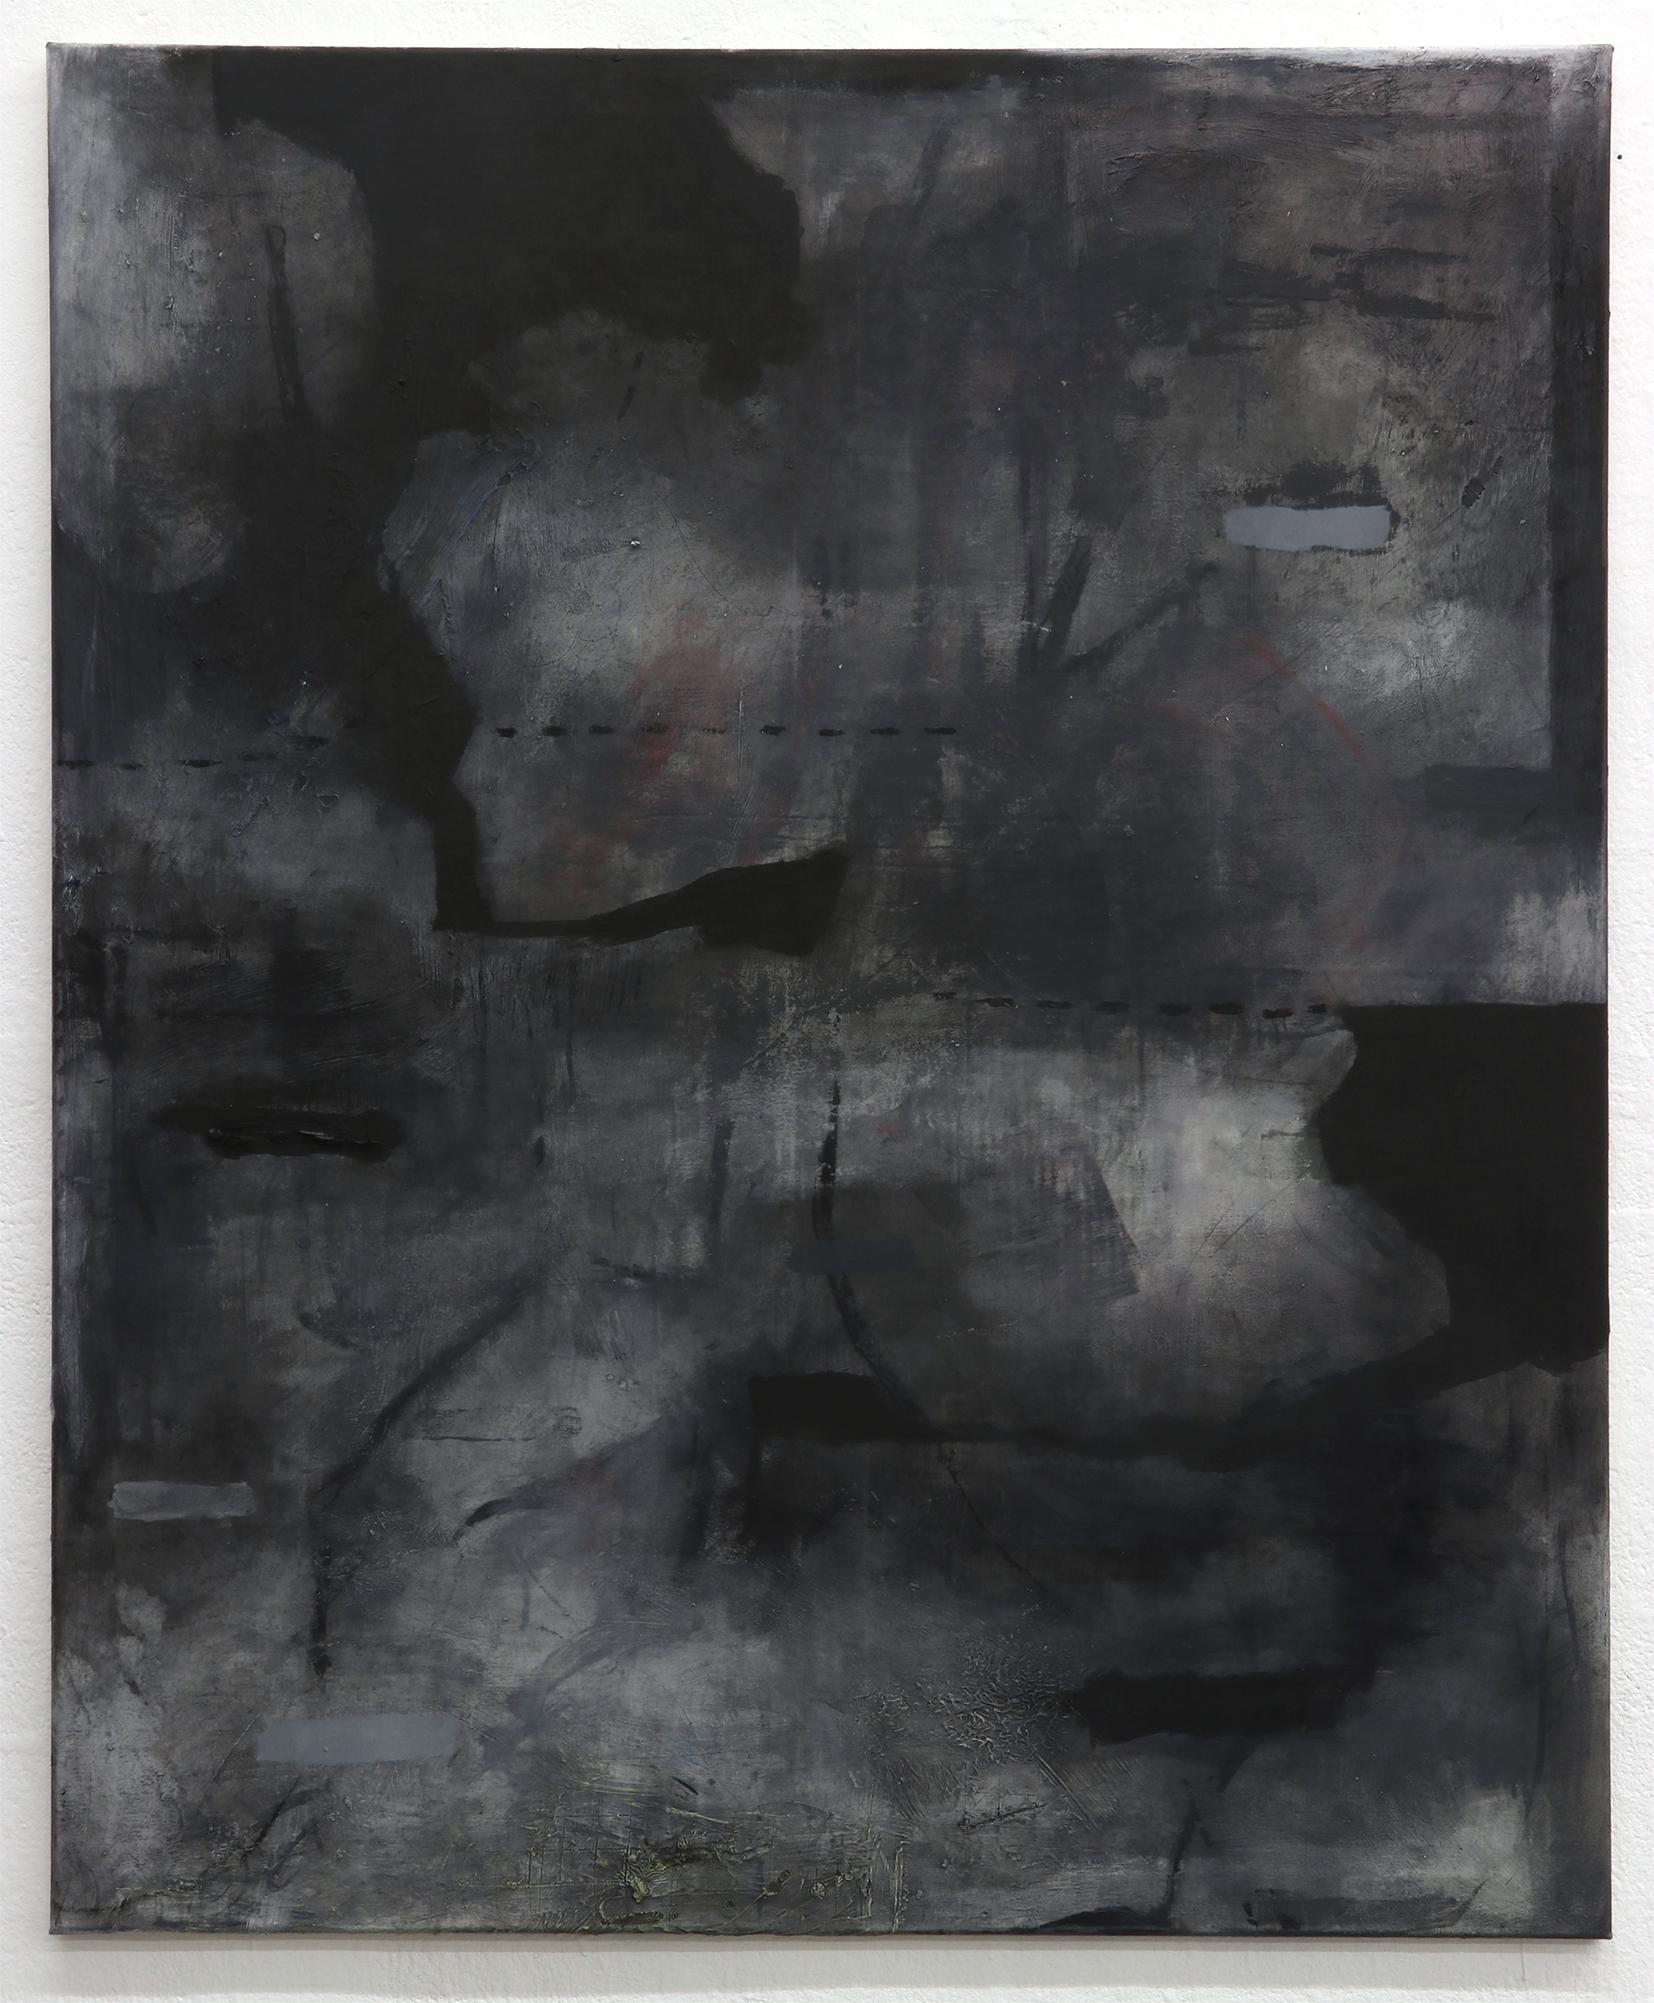 Fabian Hub, fabianhub, Hub, Malerei, painting, Berlin